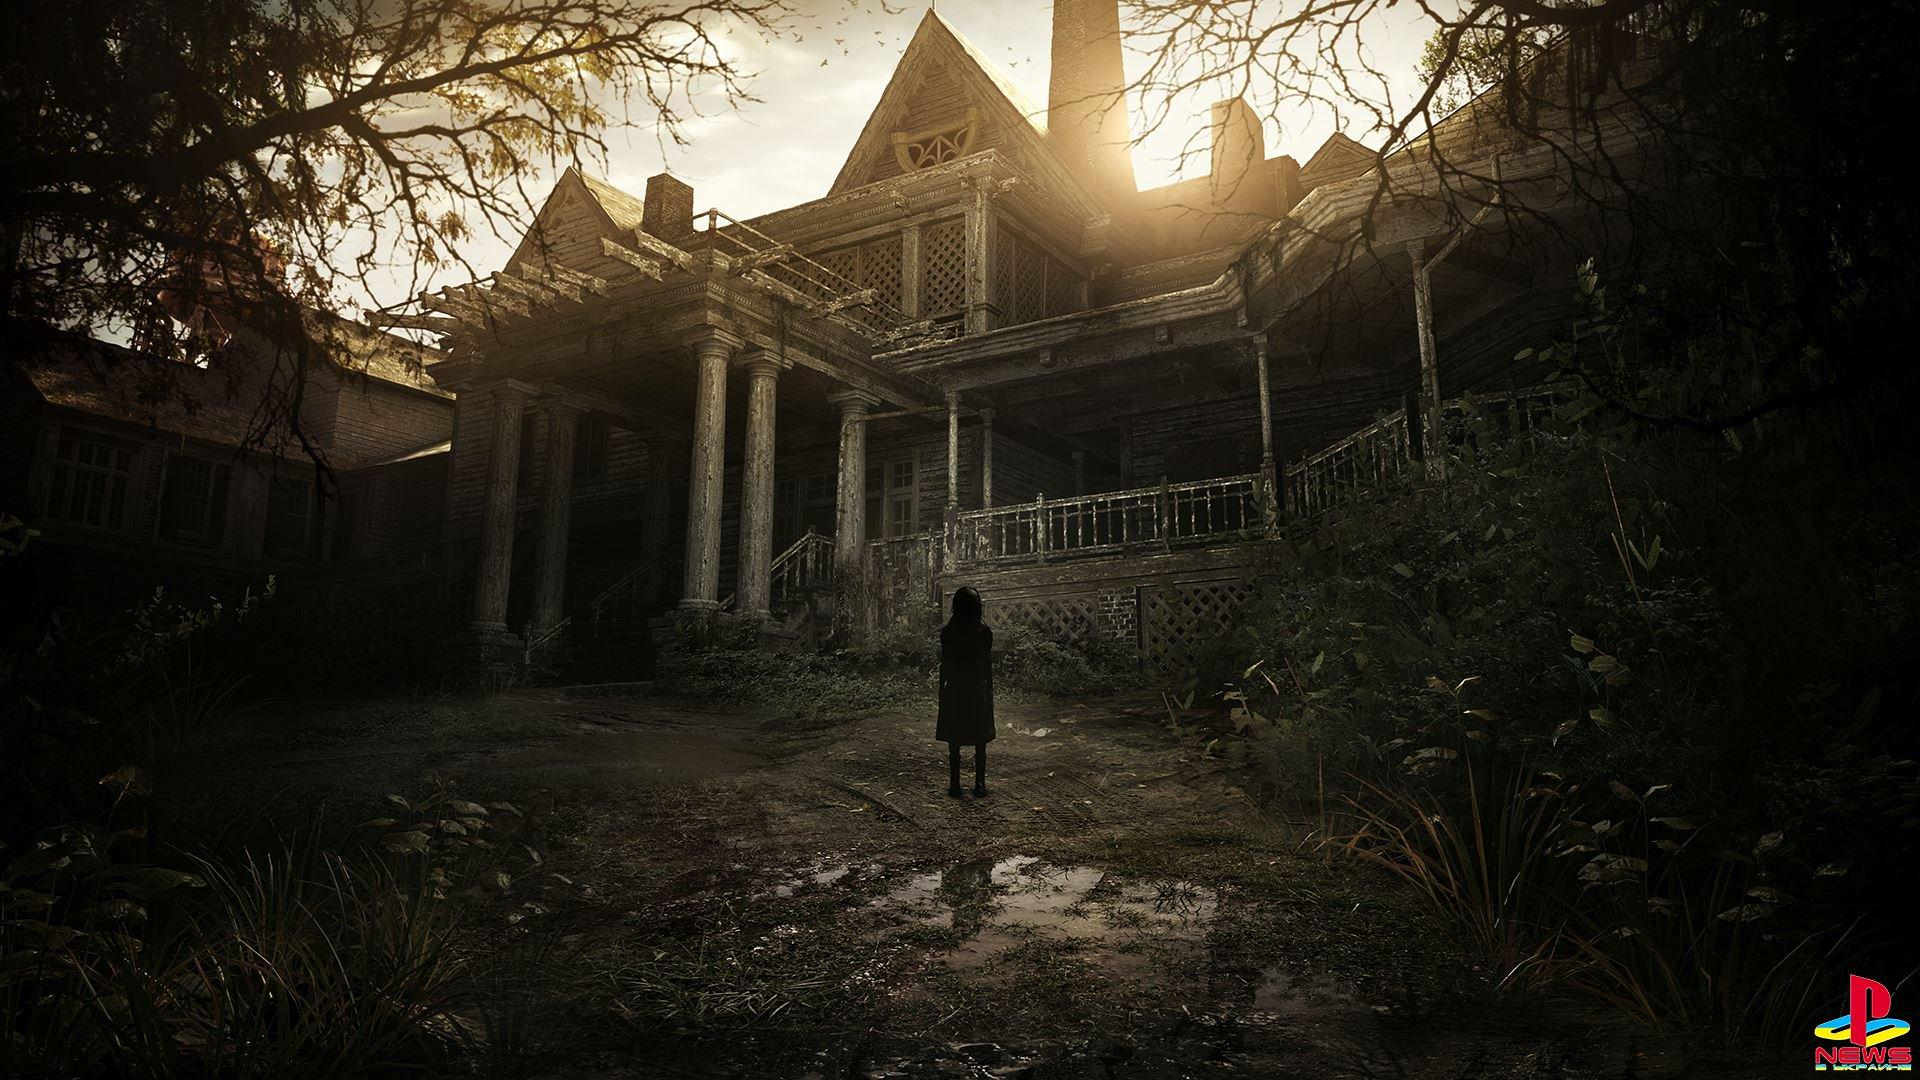 Resident Evil 7 будет работать в разрешении 1080р при 60к/с на PS4 и Xbox One